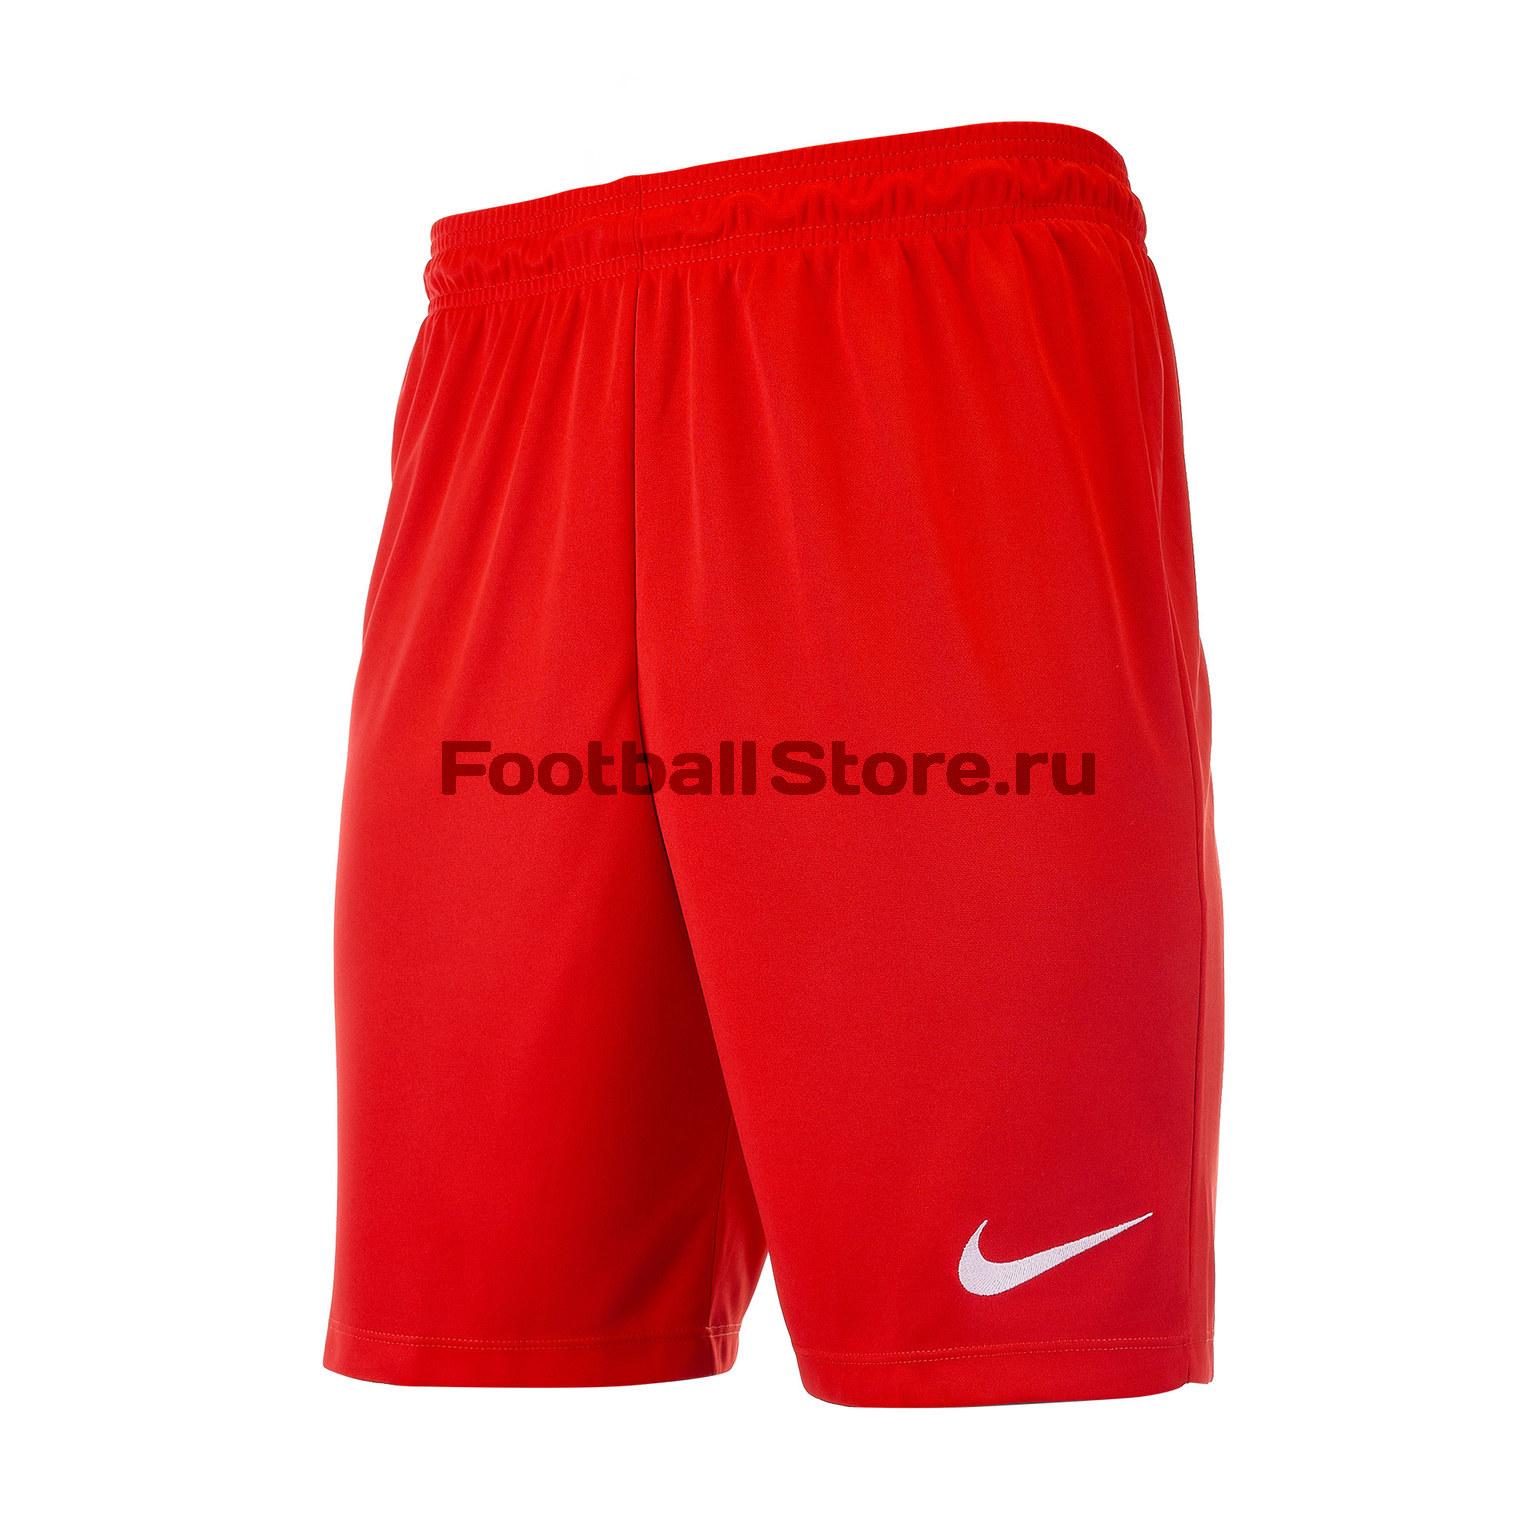 Шорты Nike Шорты Nike Park II KNIT Short NB 725887-657 игровая форма nike шорты игровые nike boys park ii nb 725988 677